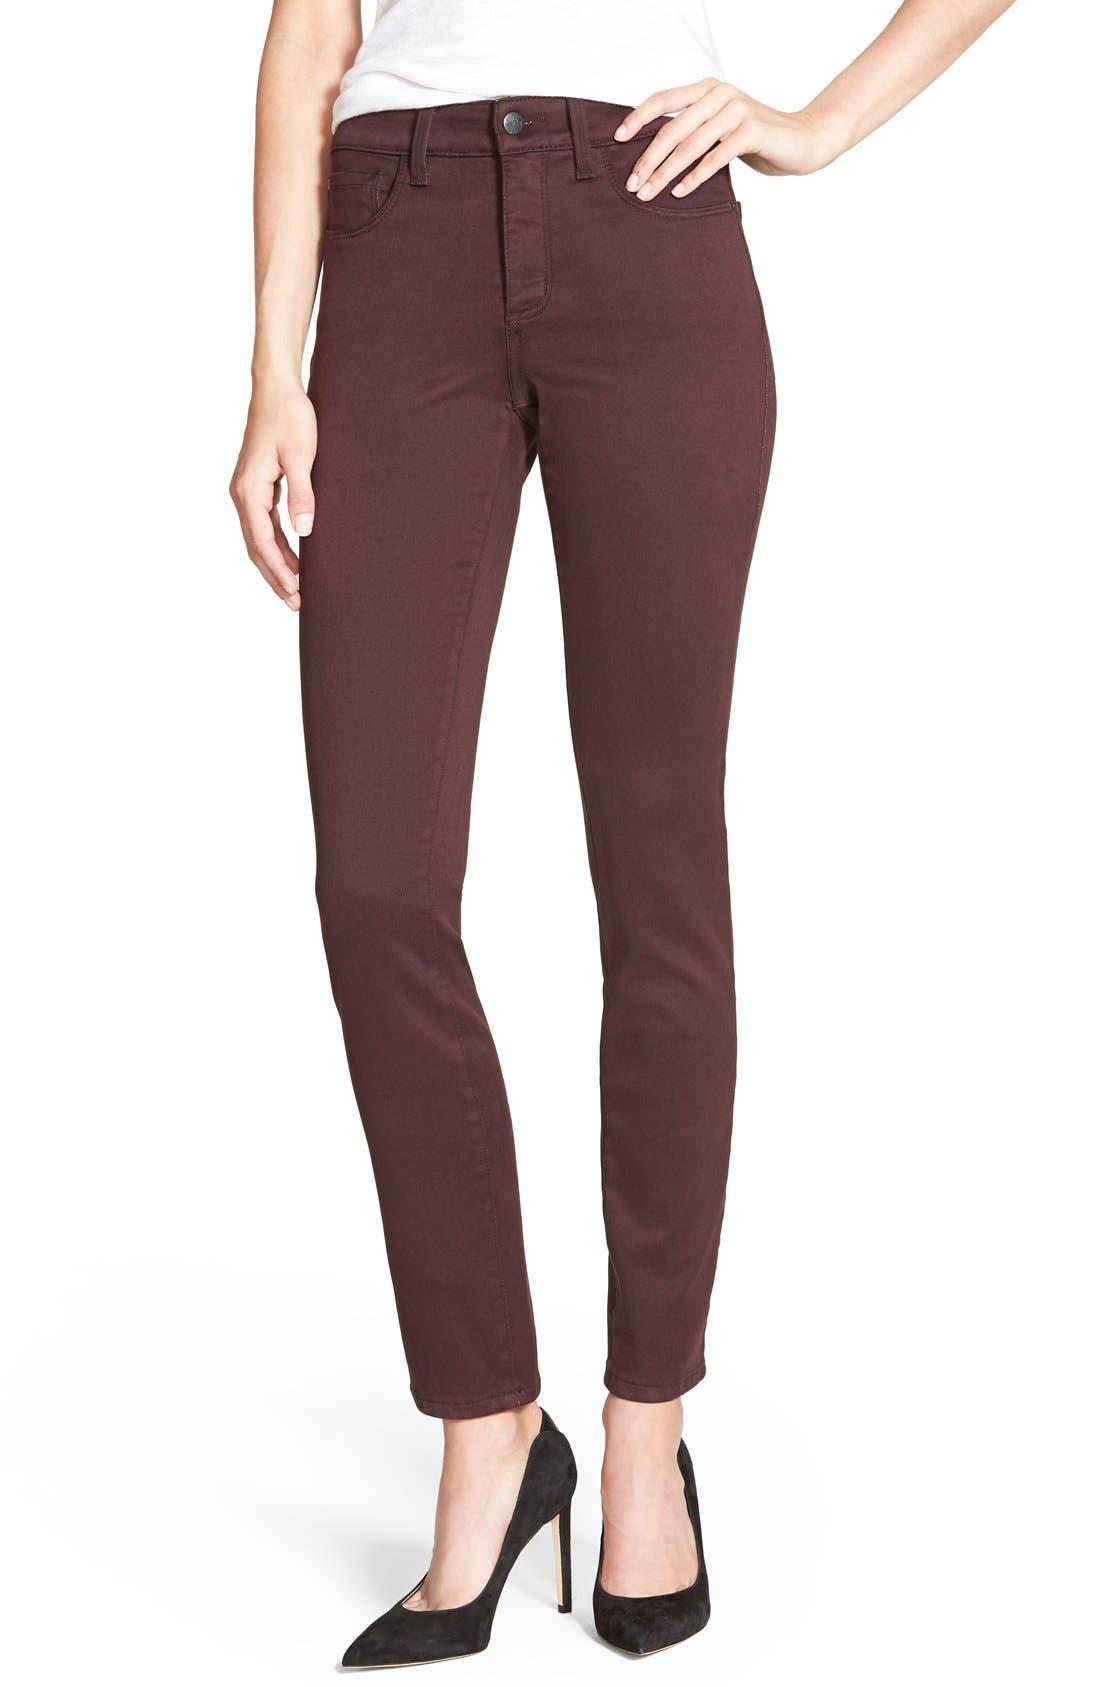 Image of NYDJ Alina Colored Stretch Skinny Jeans